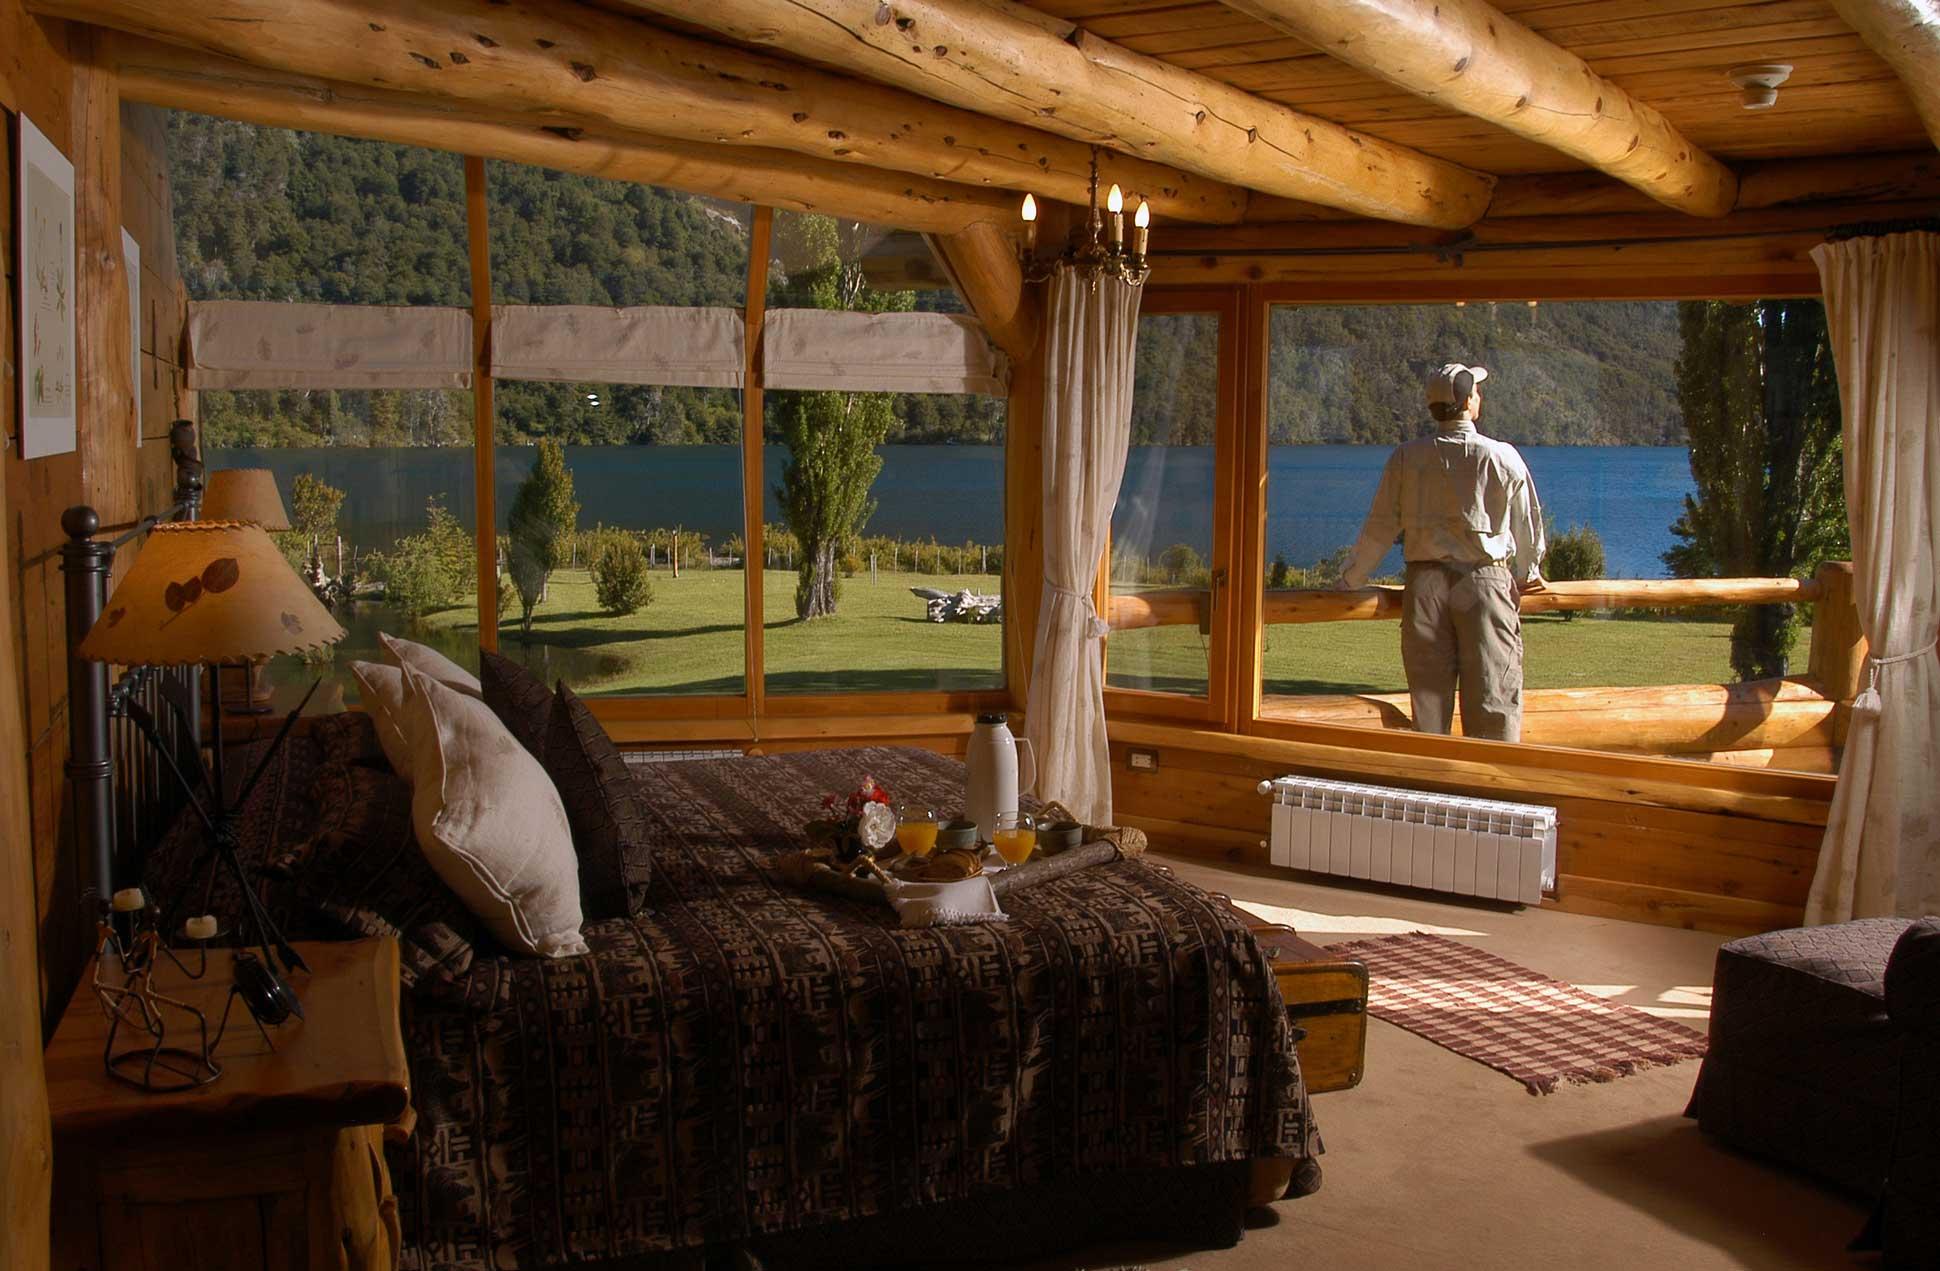 Room at Peuma Hue in Bariloche, Argentina